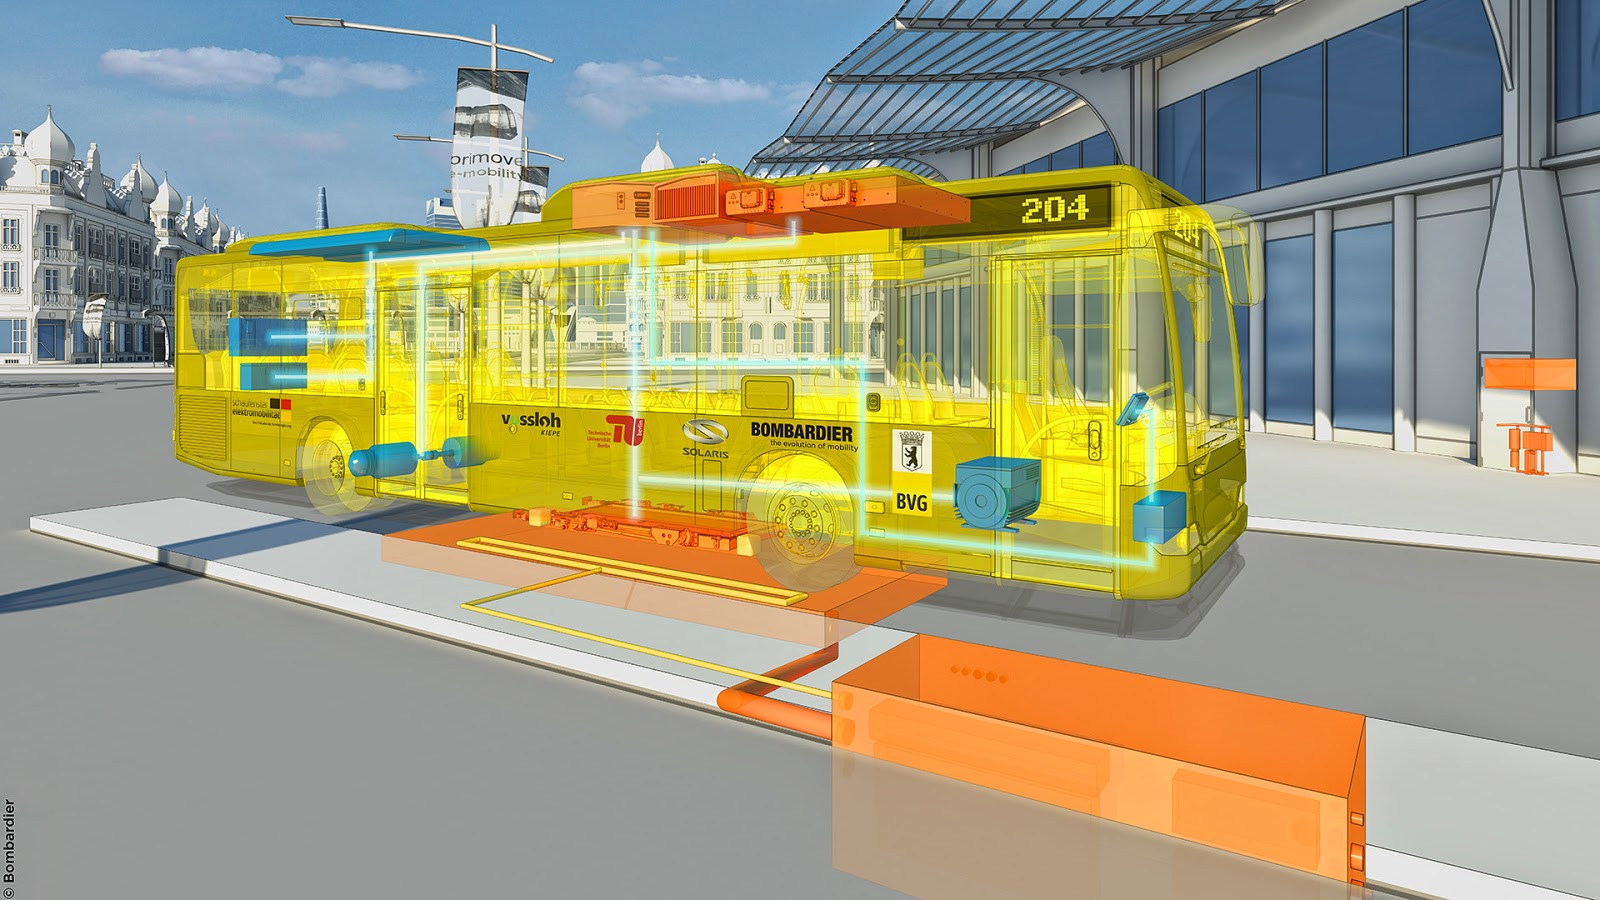 berlin adopte des bus electriques primove bombardier